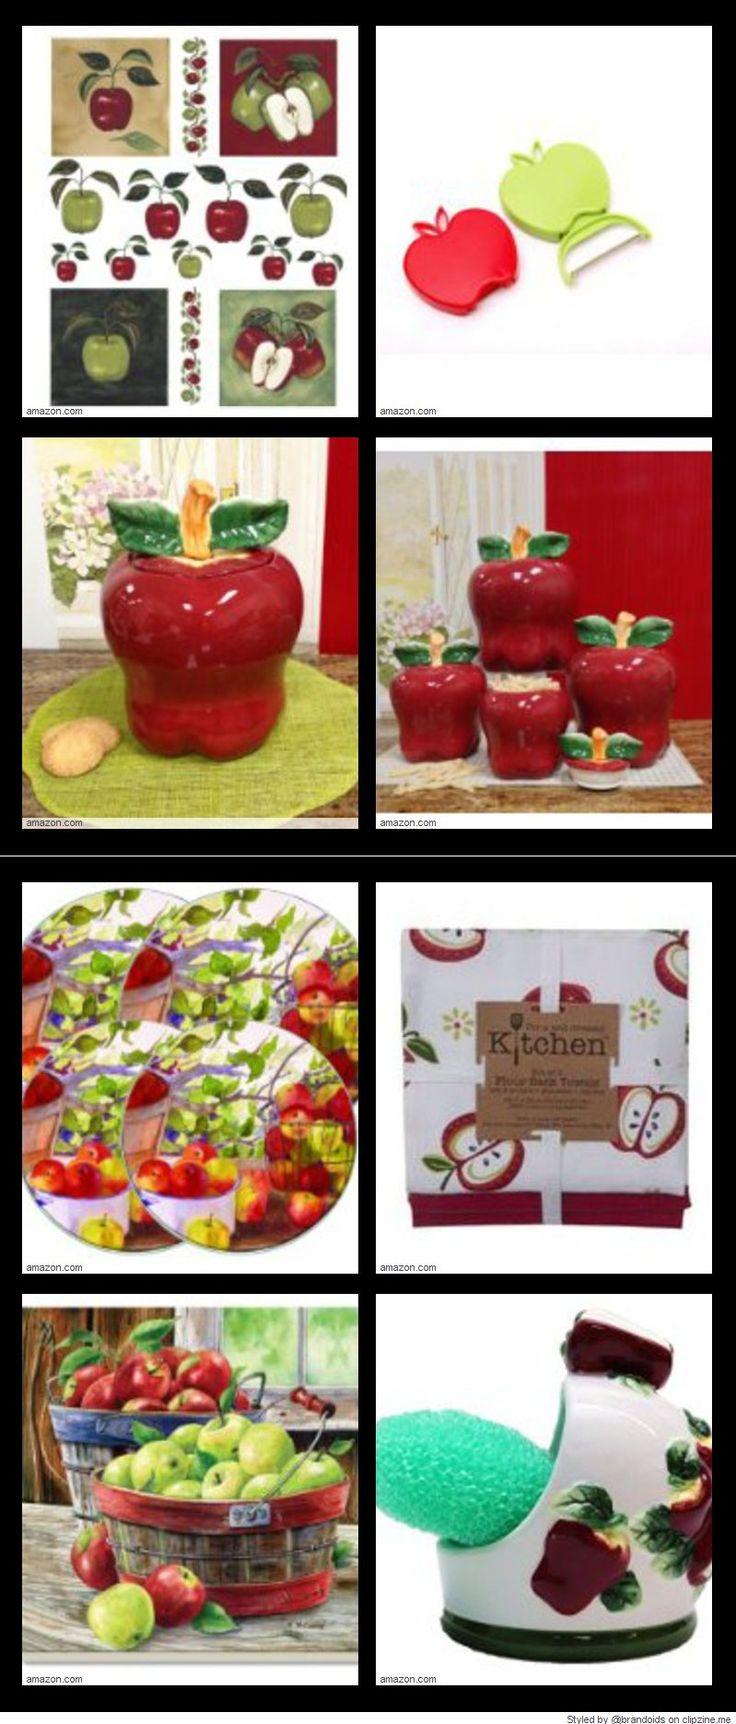 25 best ideas about apple kitchen decor on pinterest - Kitchen curtains with fruit design ...